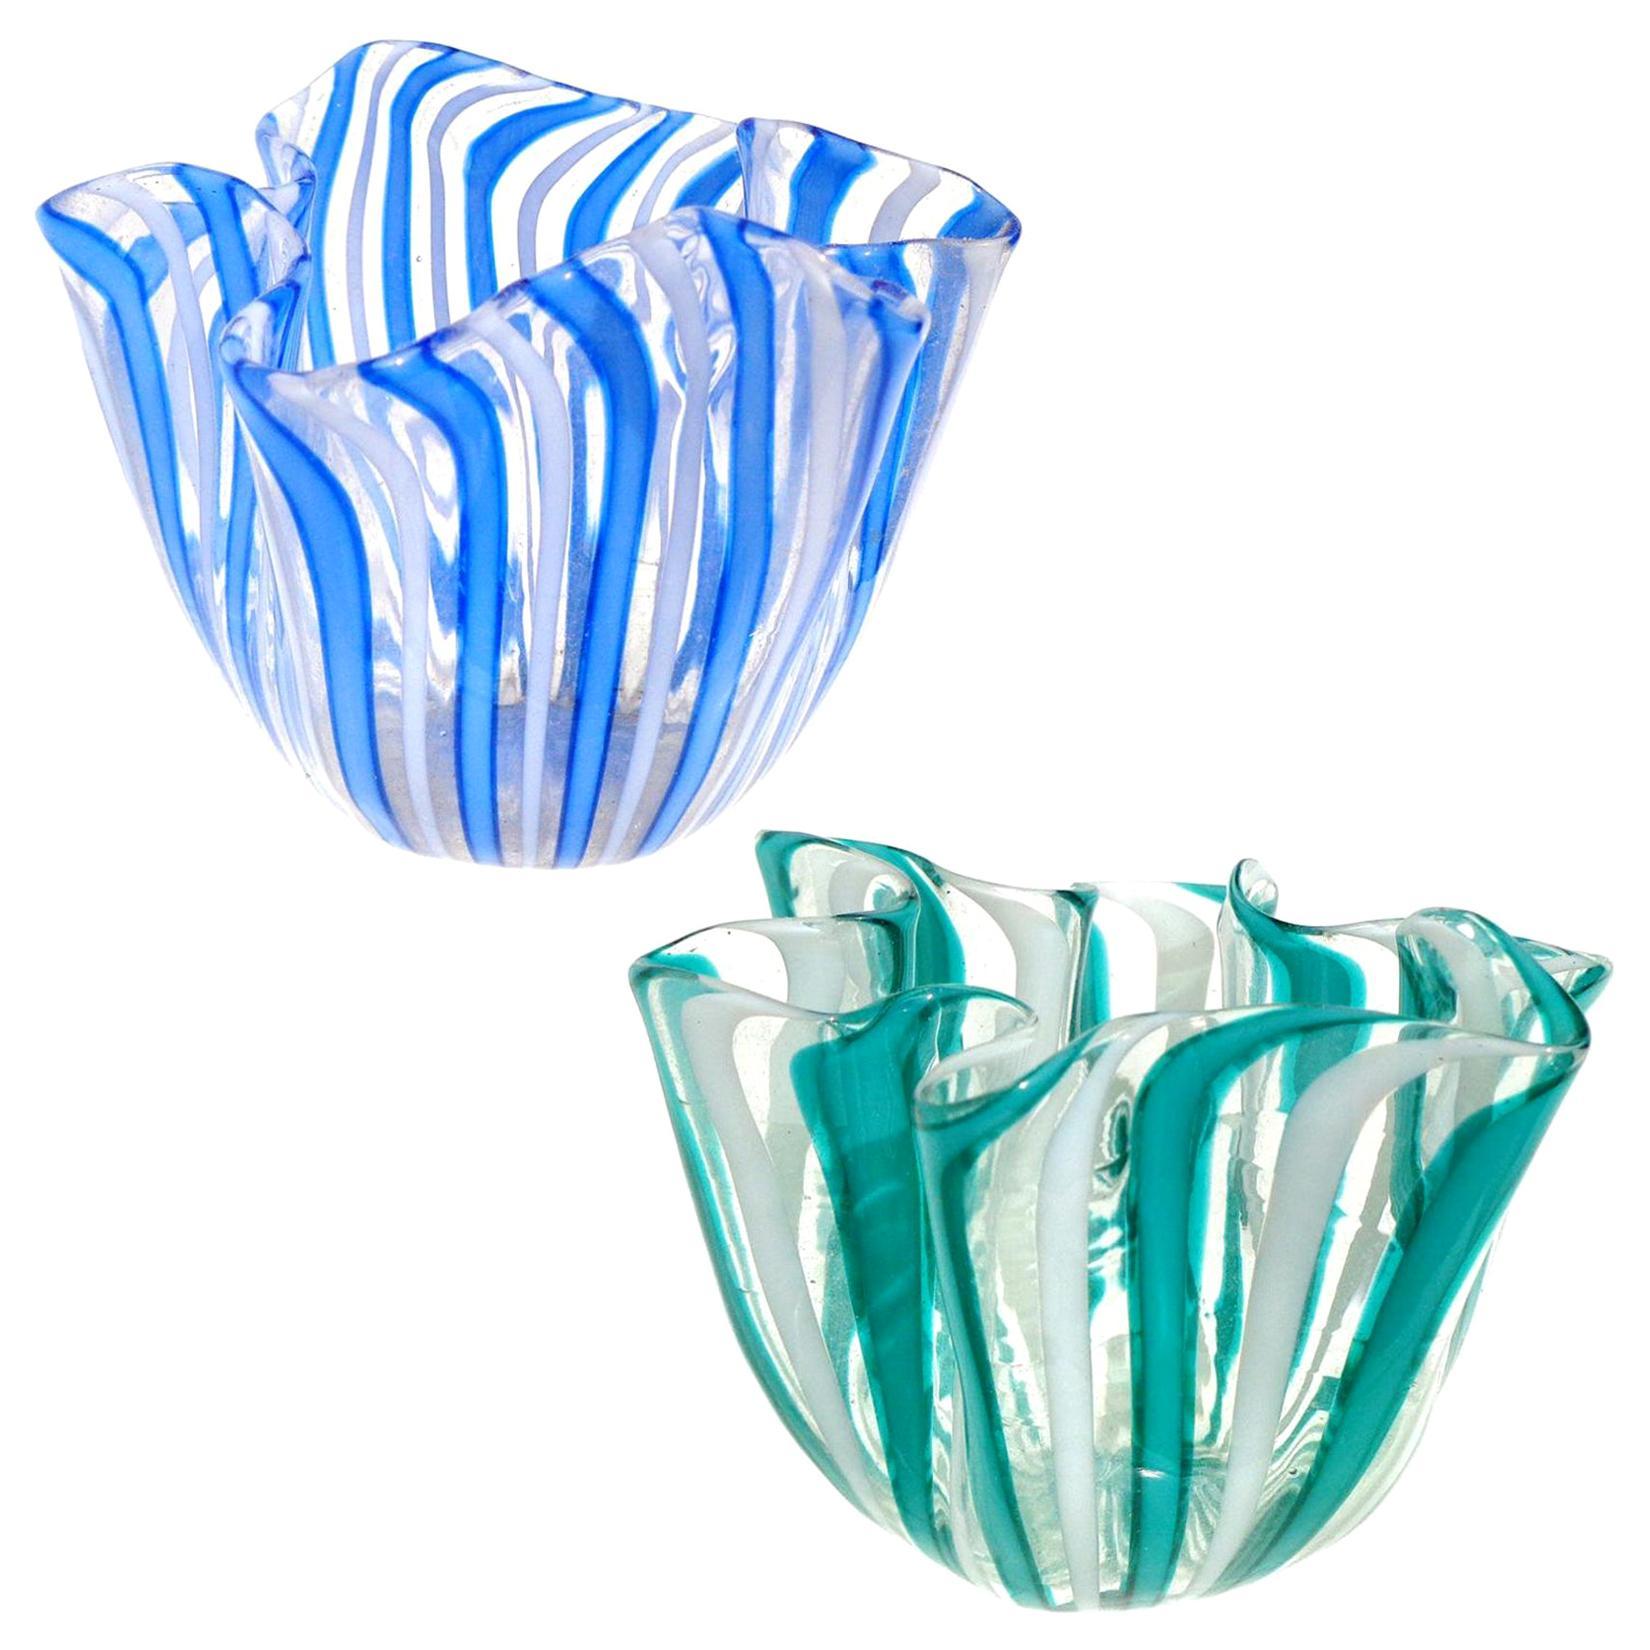 Venini Bianconi Murano Filigrana Stripes Italian Art Glass Fazzoletto Vases